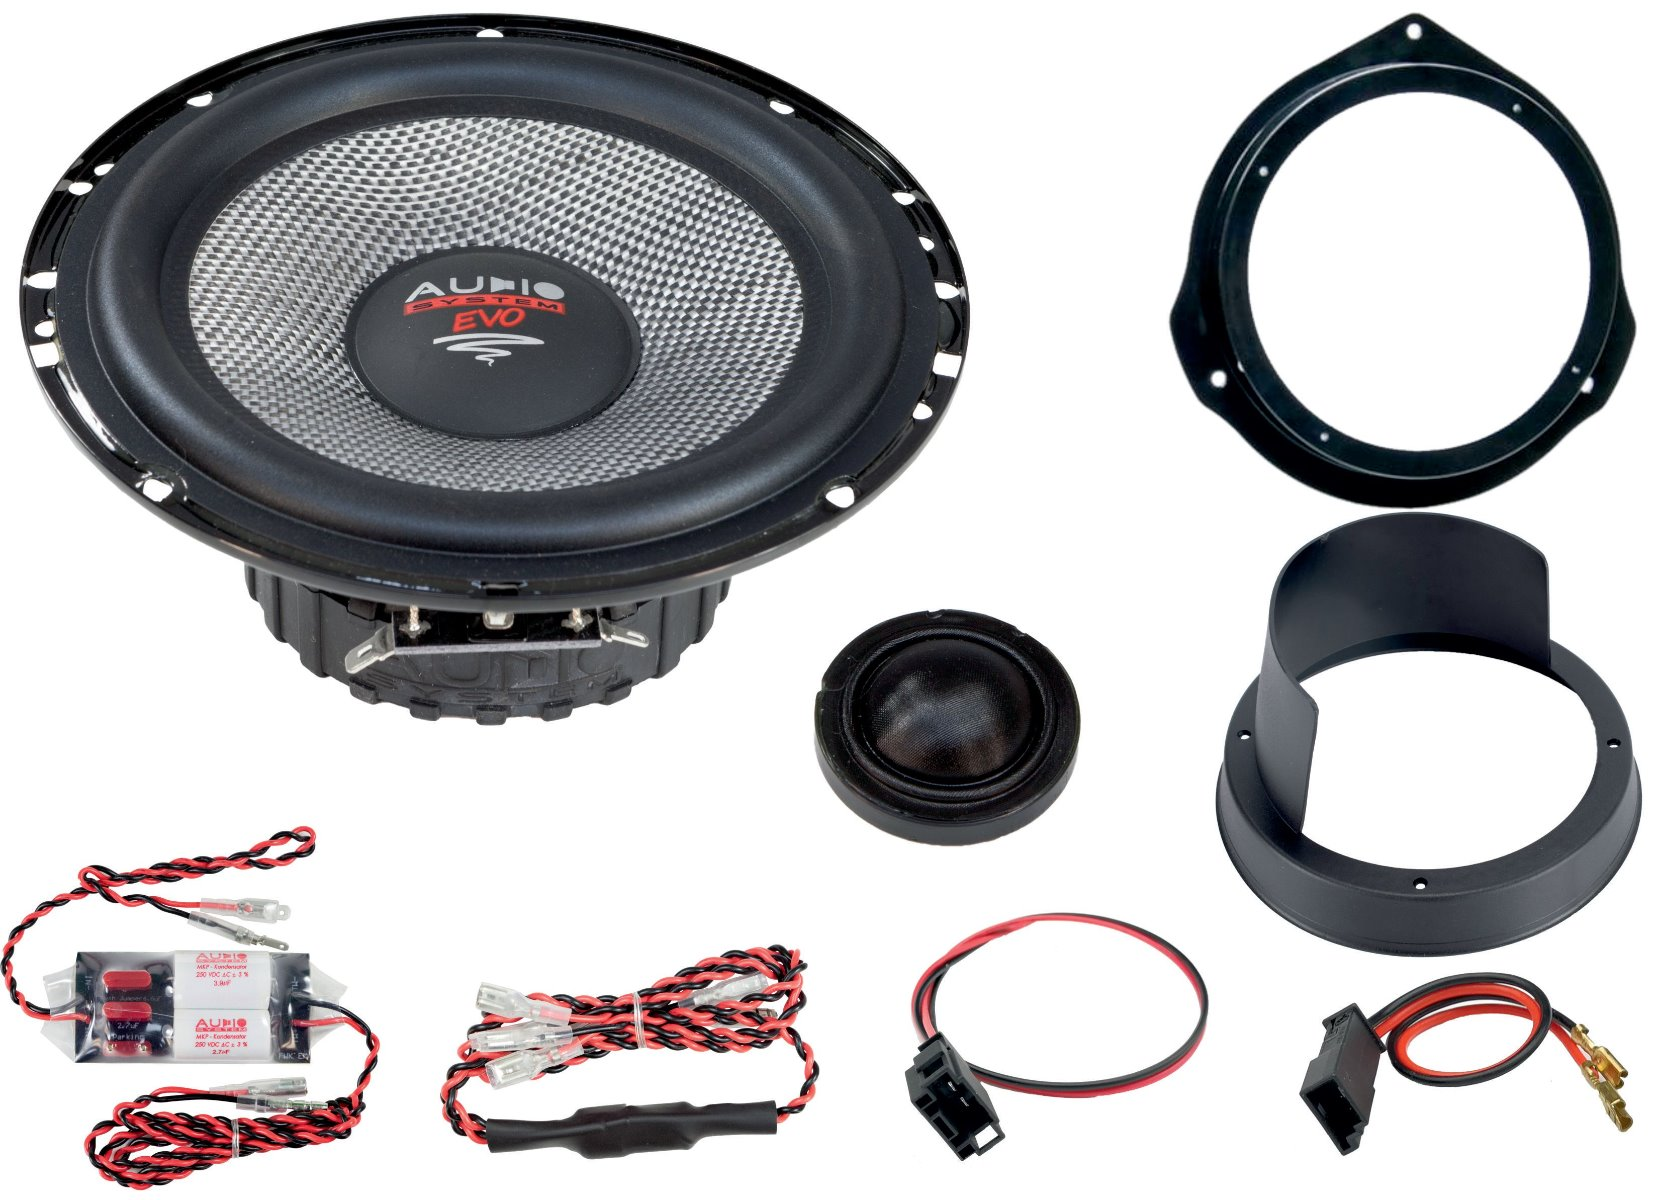 Audio System XFIT MERCEDES X-KLASSE 470 EVO 2 Lautsprecher 165 mm 2-Wege MERCEDES X-KLASSE 470 Compo System